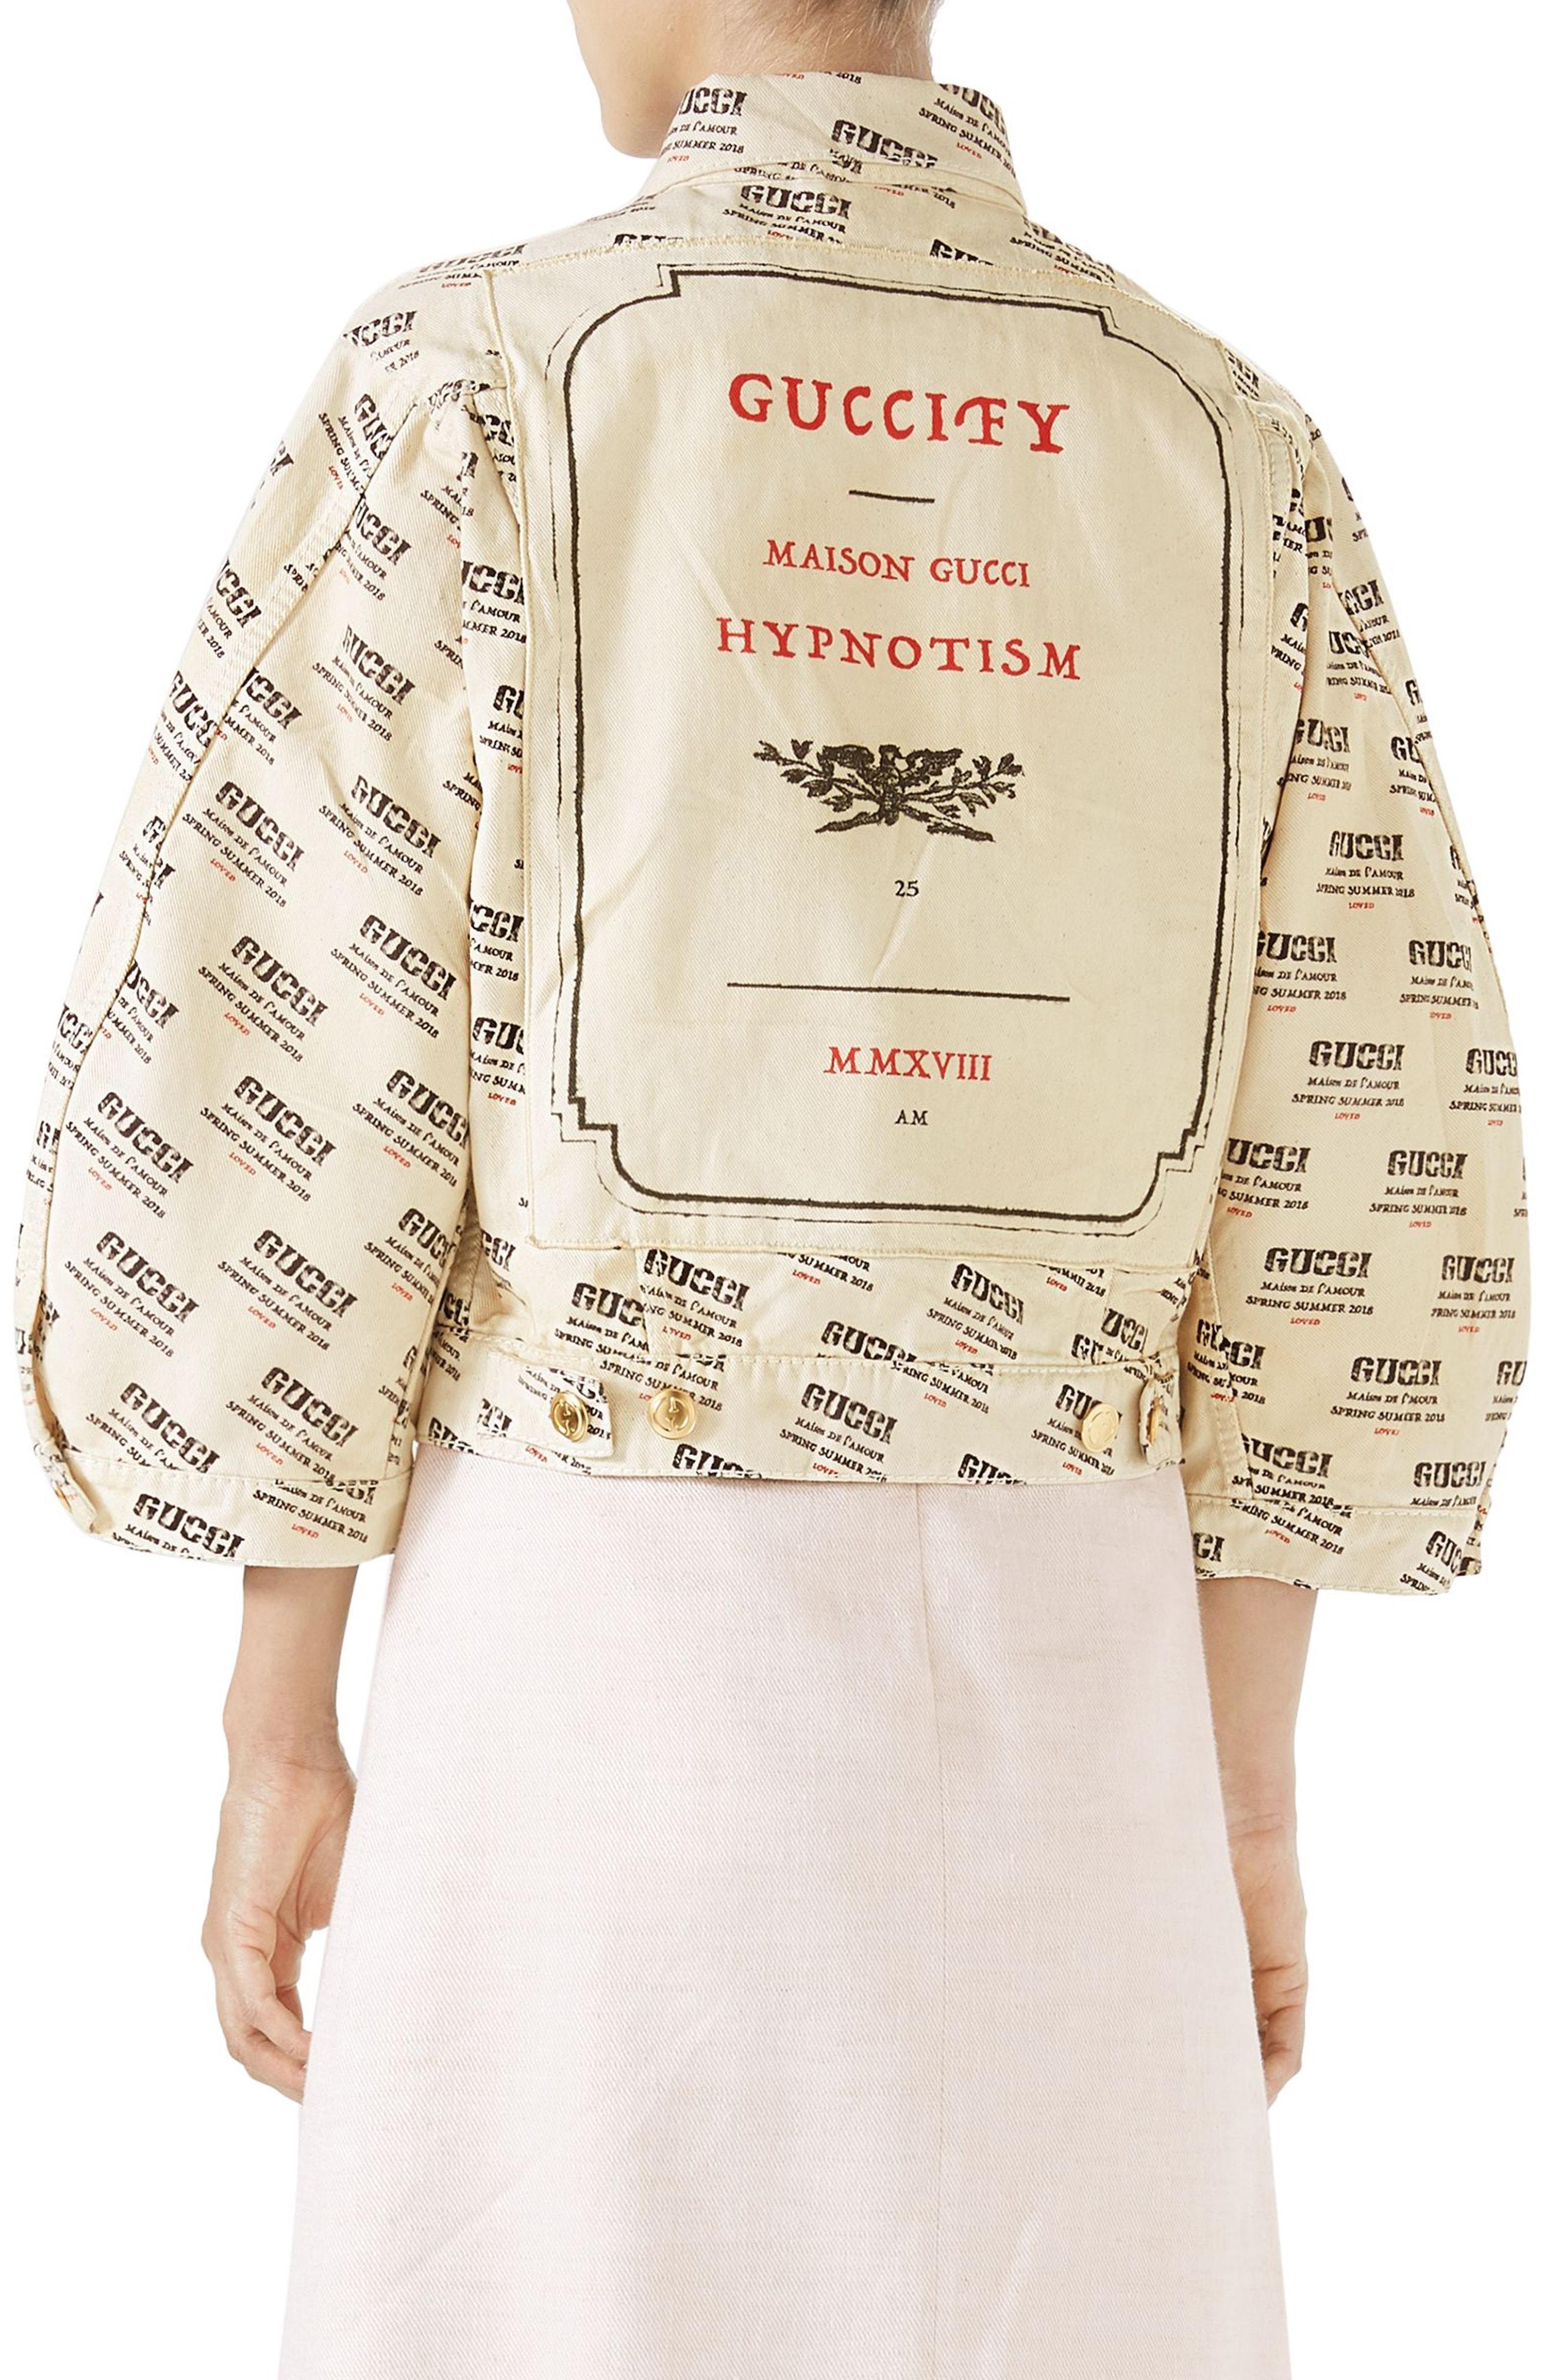 76f8aa520d7 Gucci Logo Stamp Print Denim Jacket In White In Beige